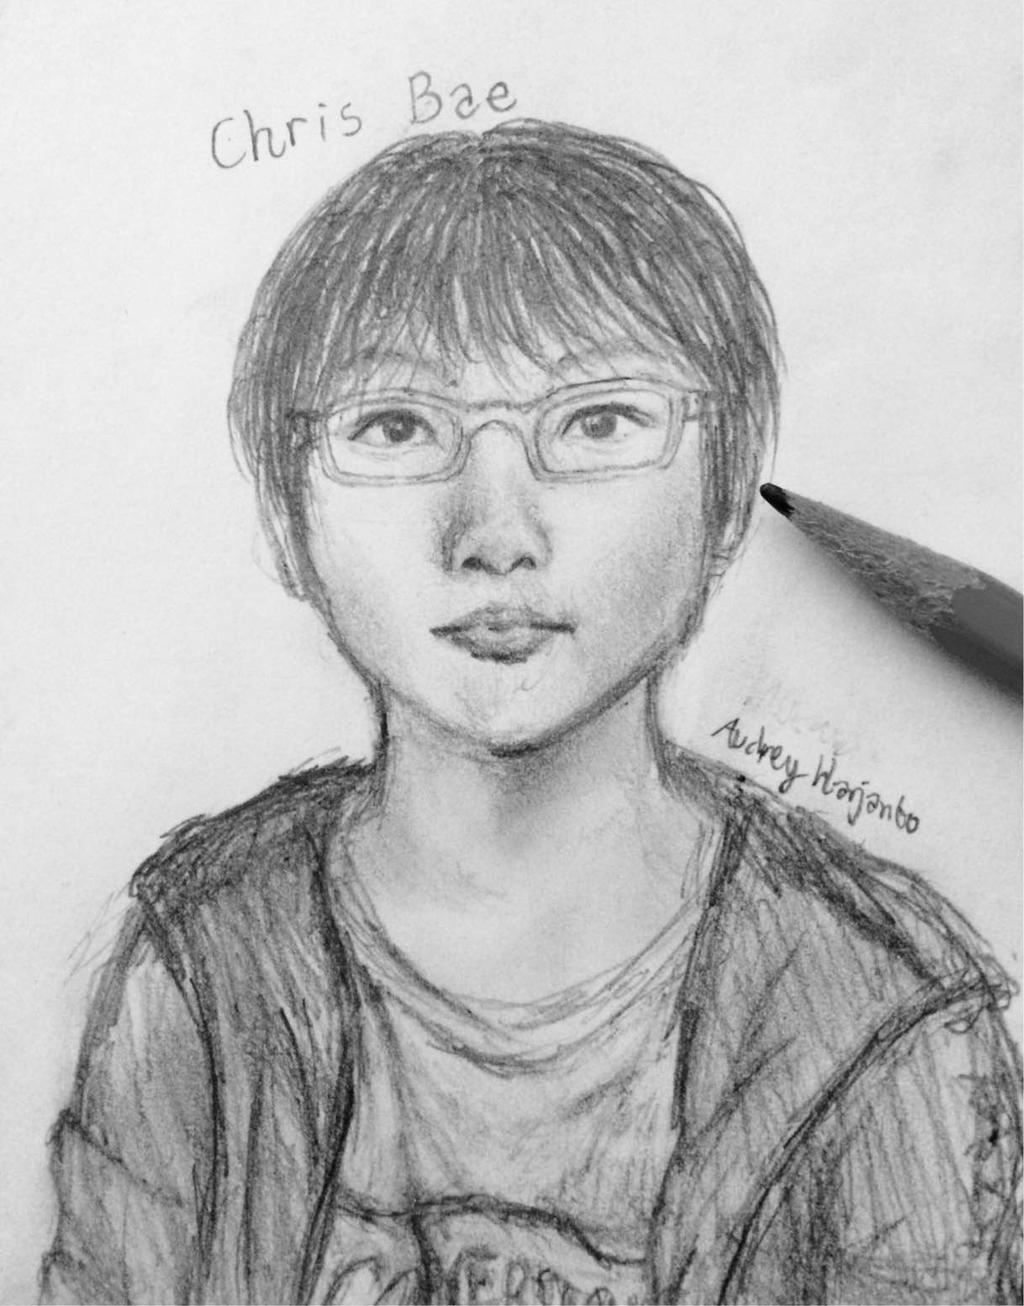 Chris Bae by DragonFang17